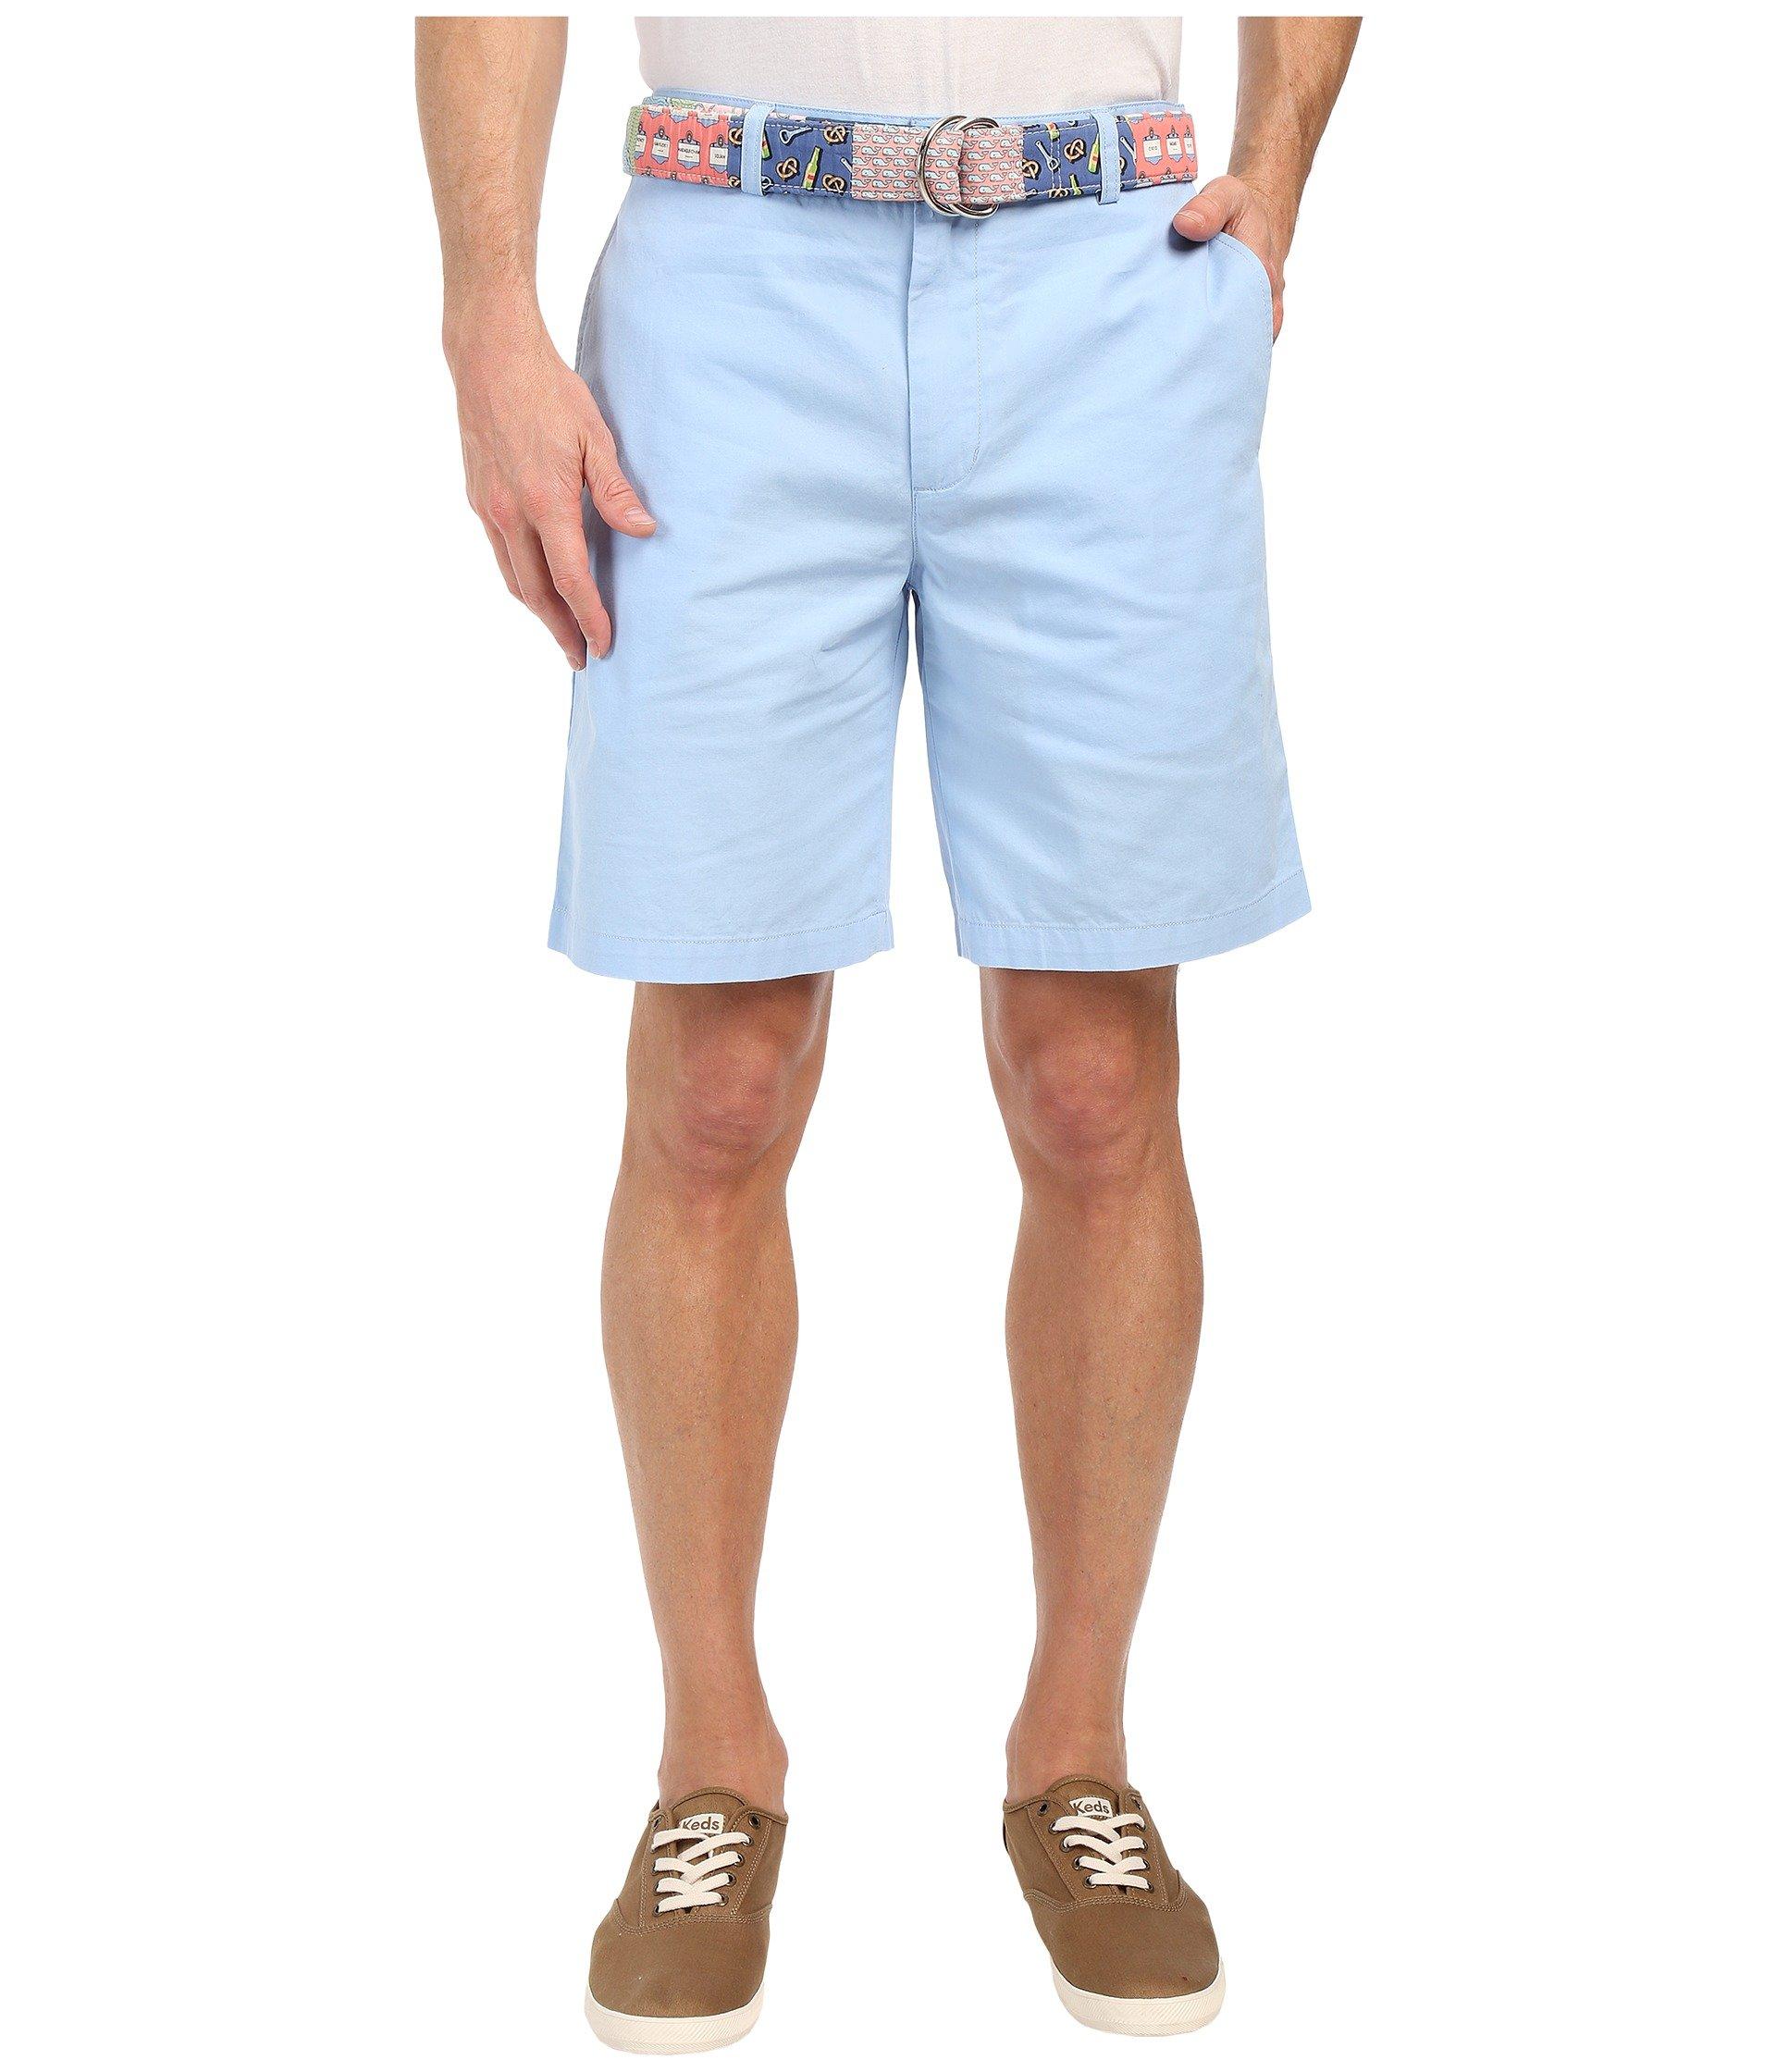 Vineyard Vines Men's 9'' Summer Twill Club Shorts (32 X 9)